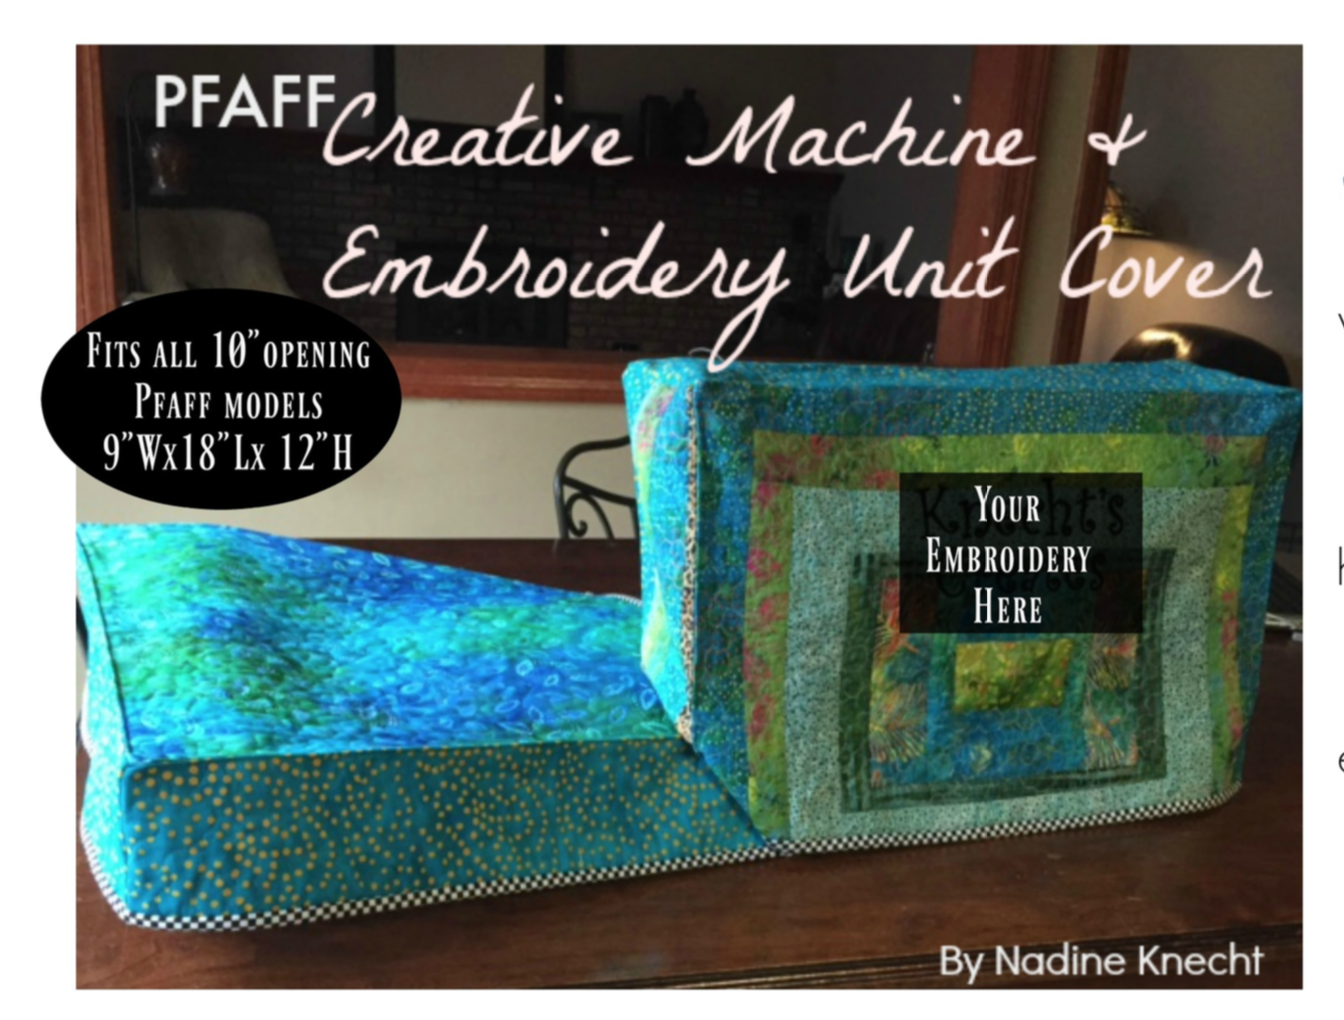 PFAFF Creative Machine Cover